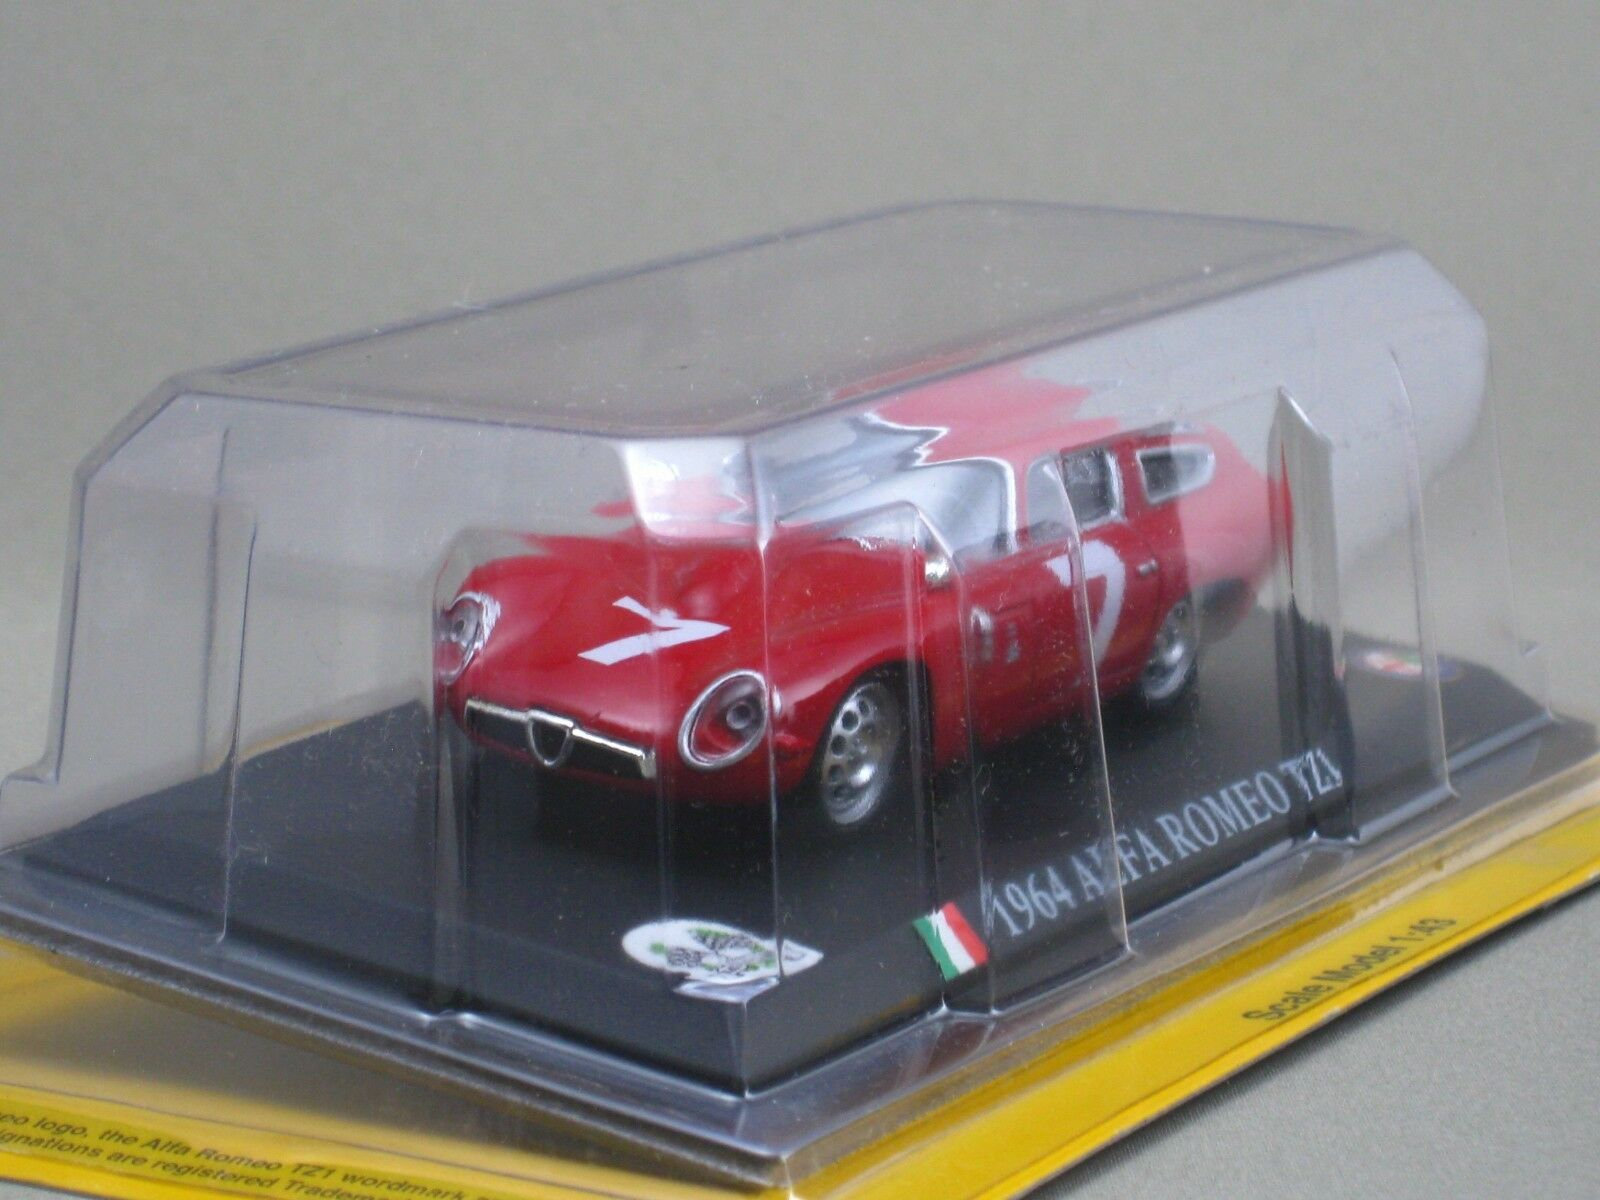 Alfa Romeo TZ1 TZ1 TZ1 1964 1 43 Die Cast Modelo World Racing Car Colección DELPRADO d15ac8